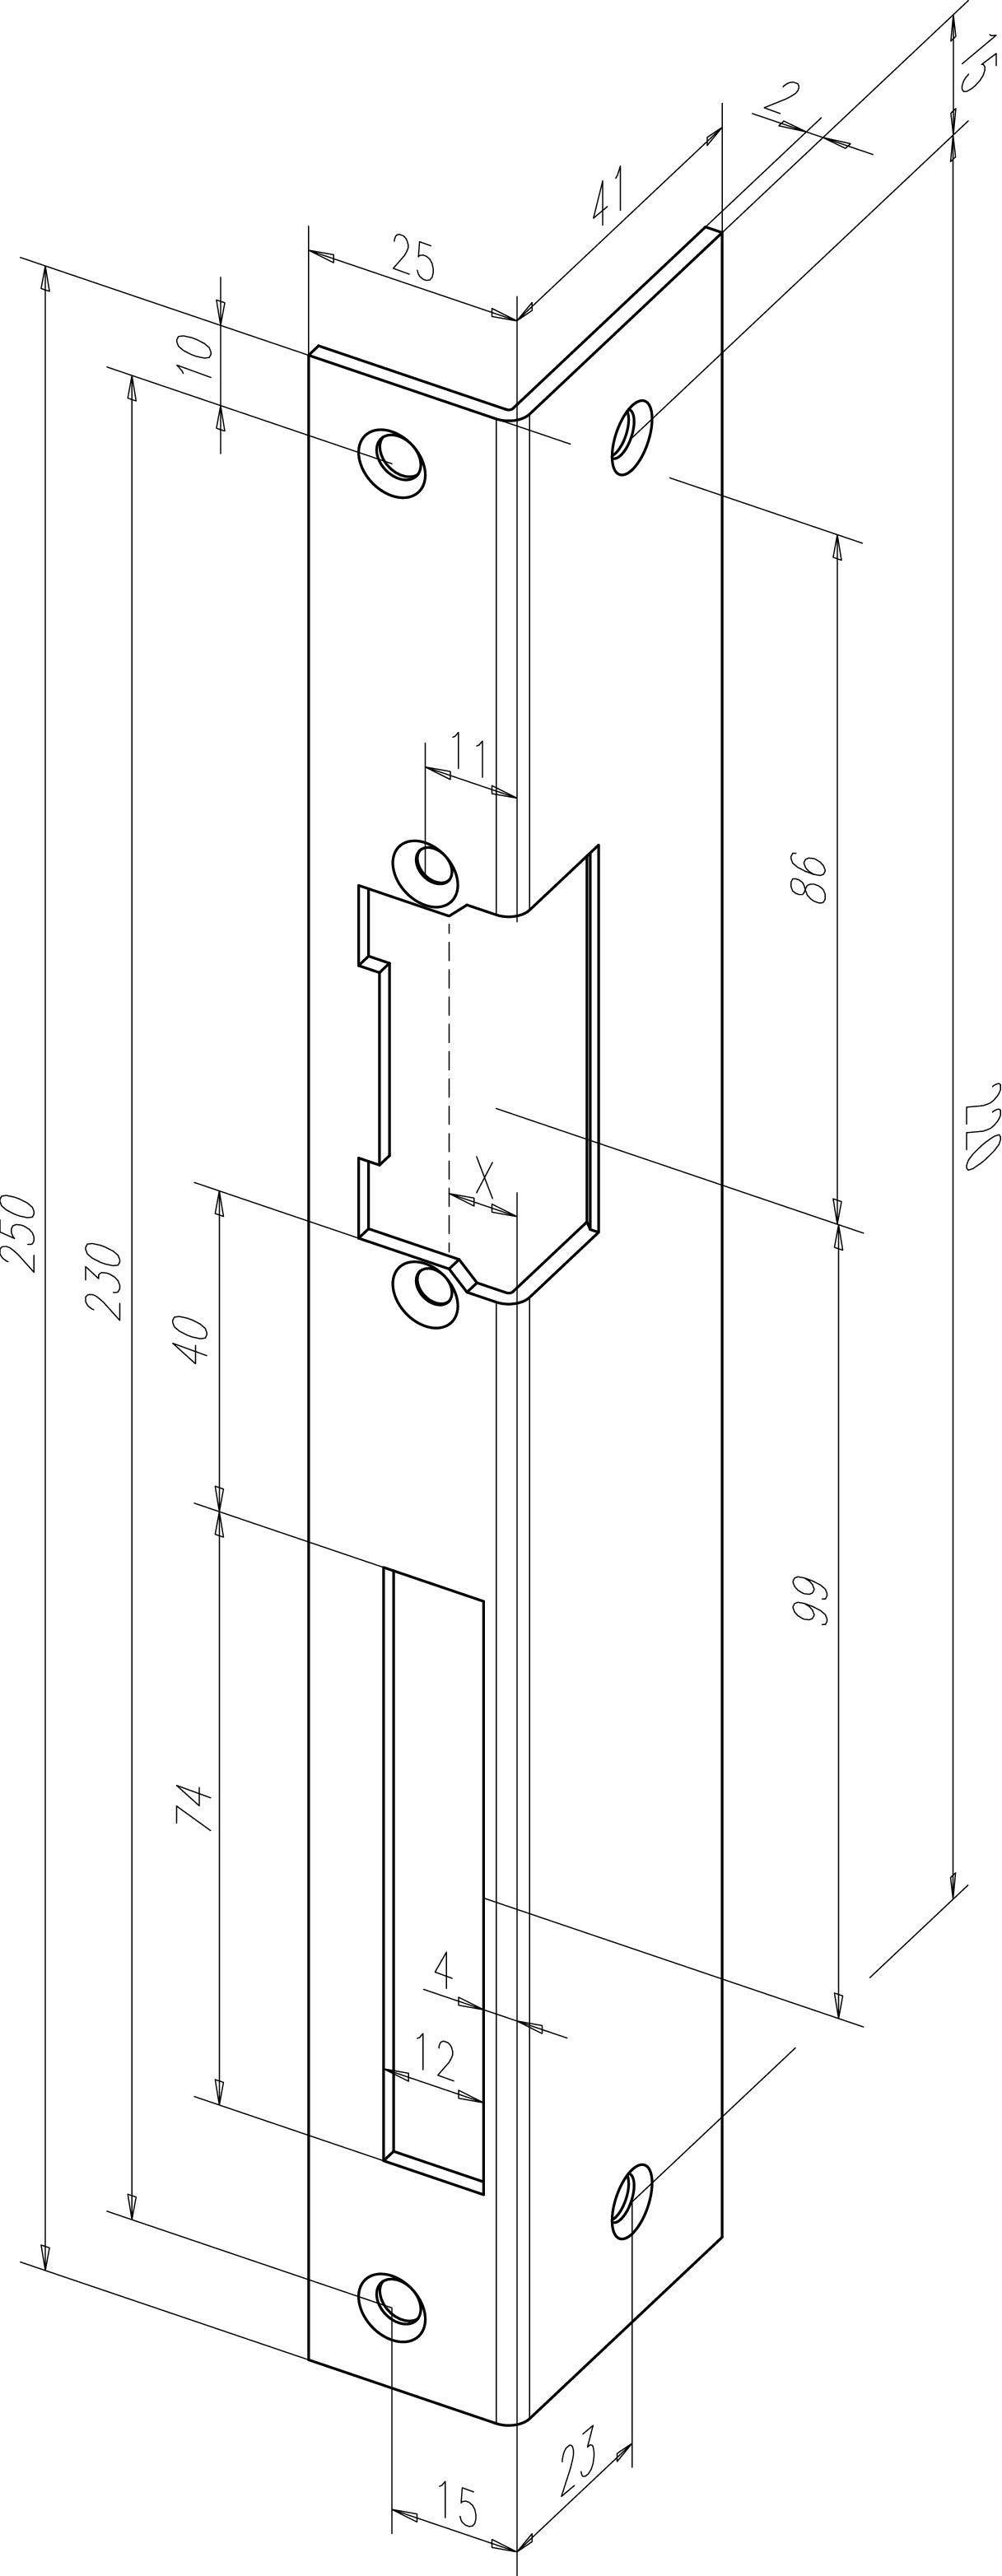 422xx 04 angeld strike plate angeld strike plate square cut bracket